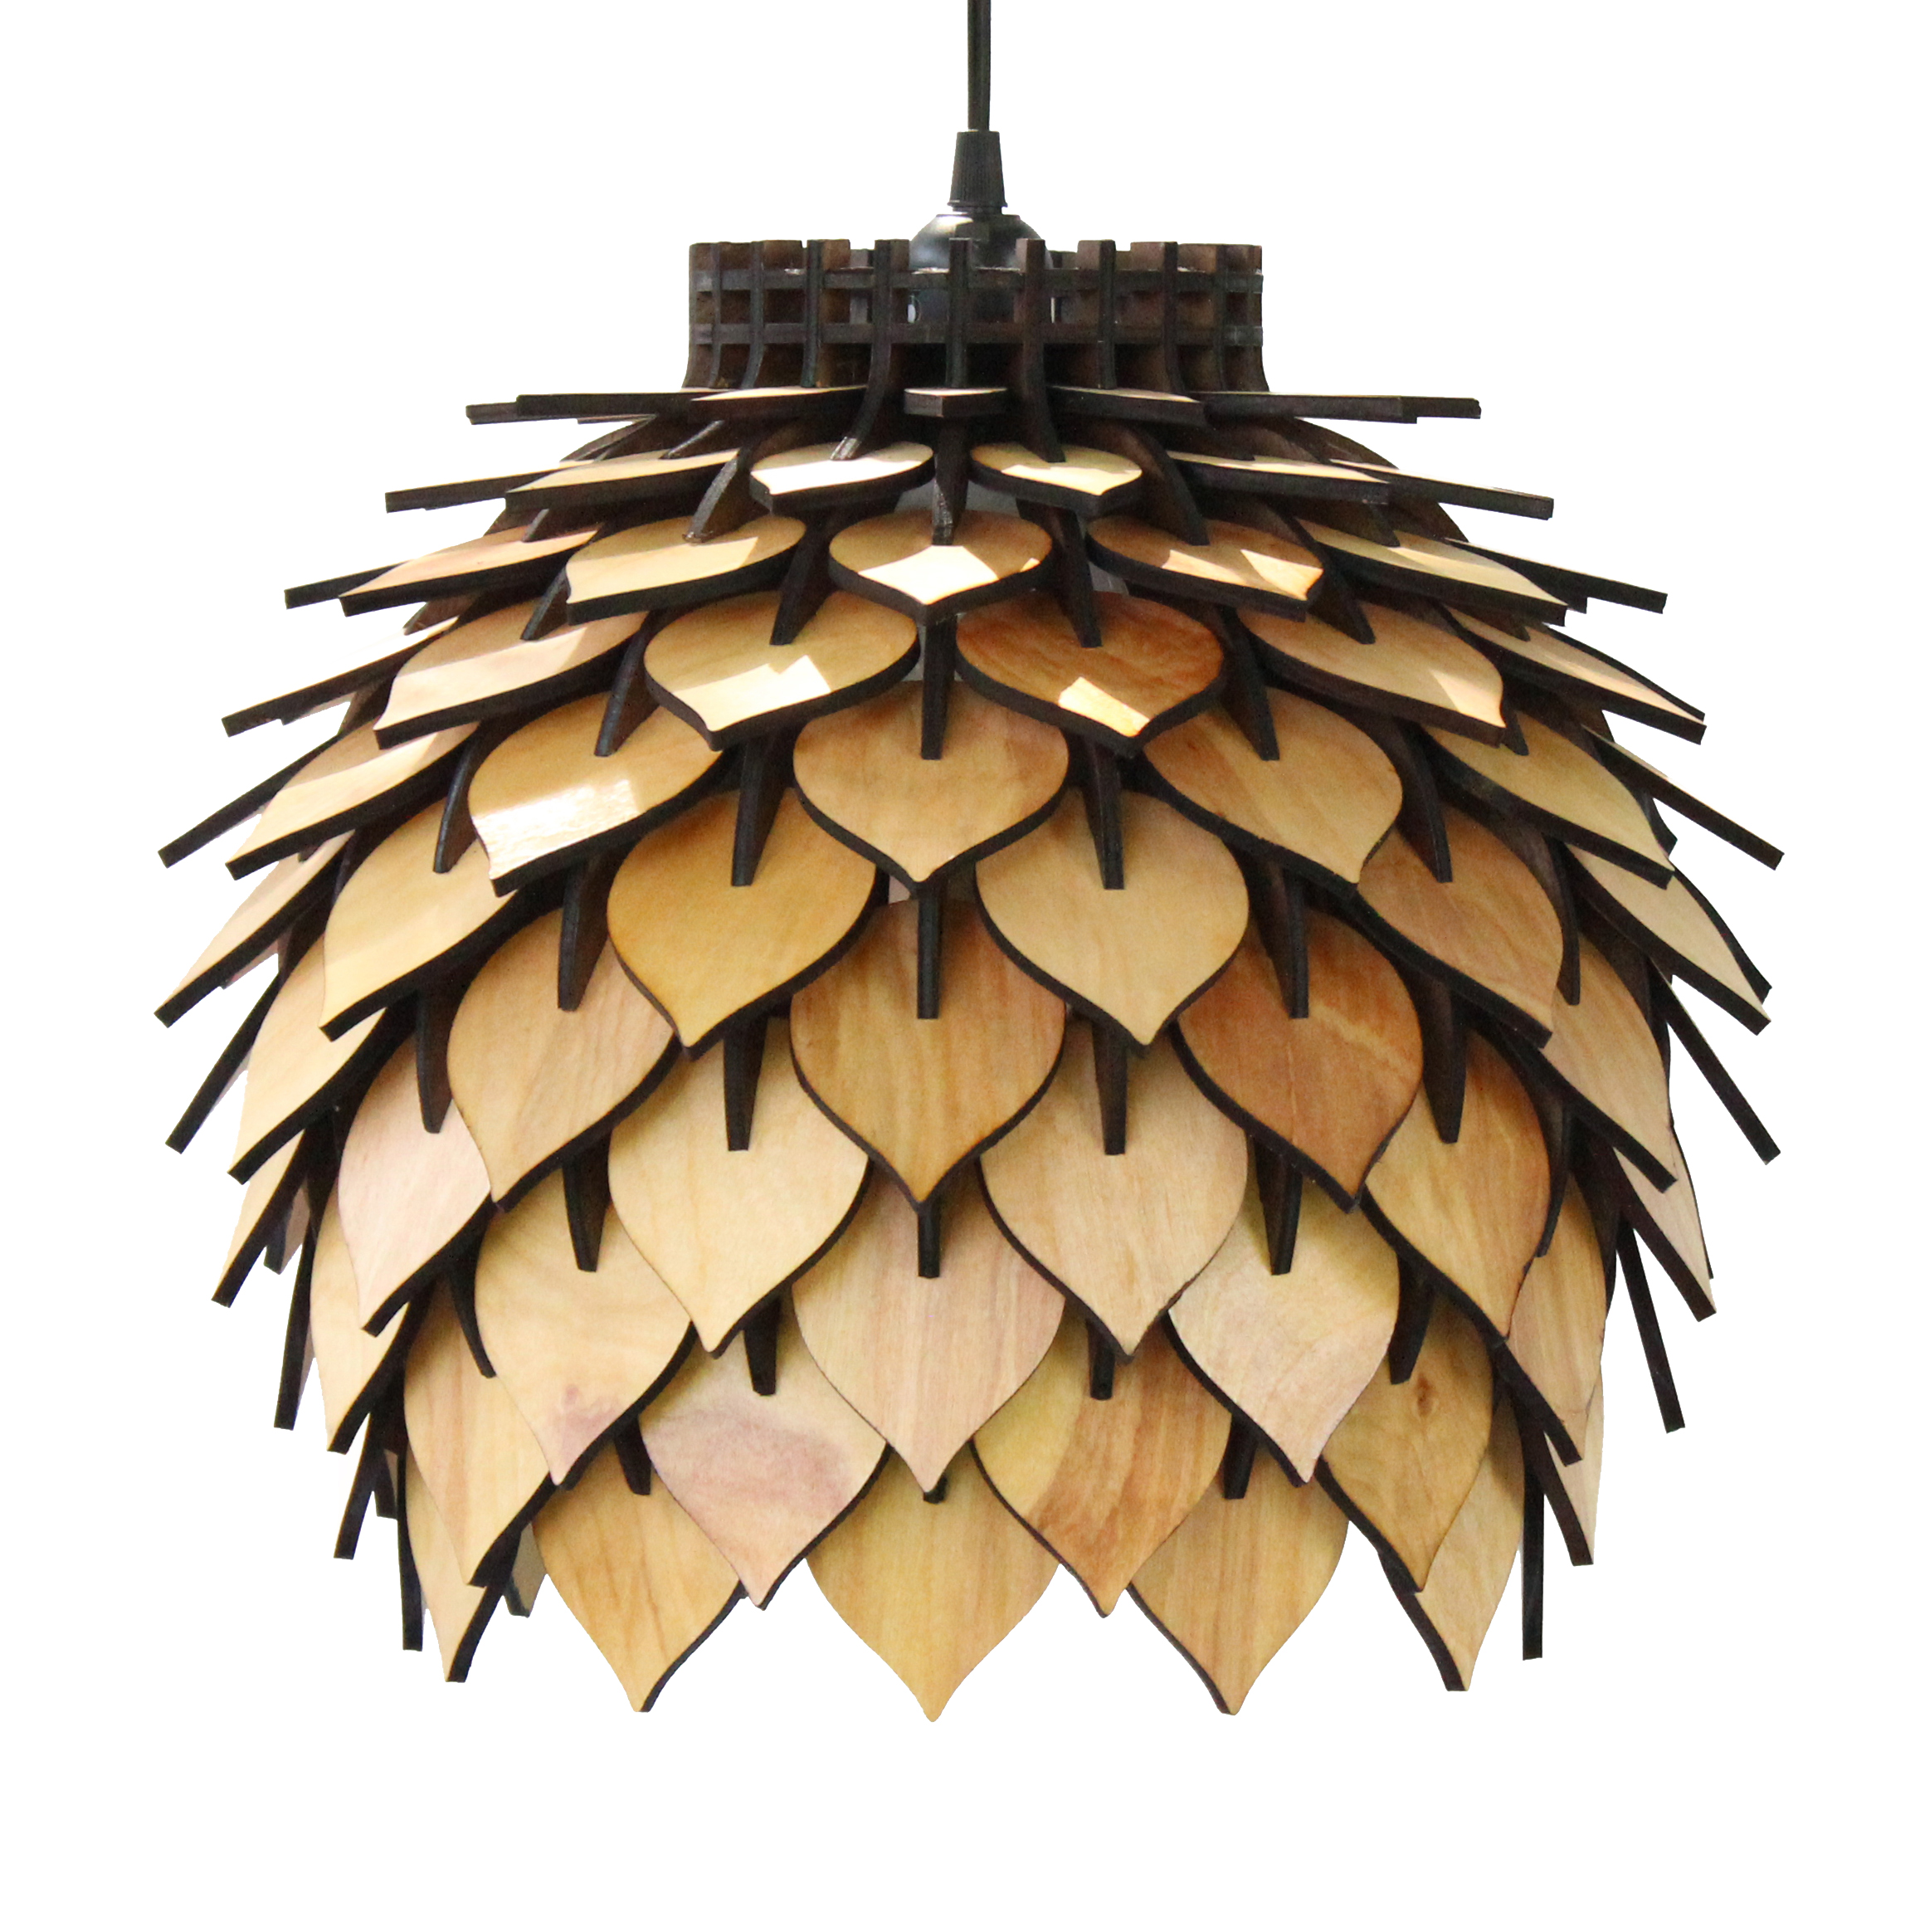 spore lamp – handmade laser cut parametric postmodern interior light geometric wooden pendant lamp terraform design.jpg